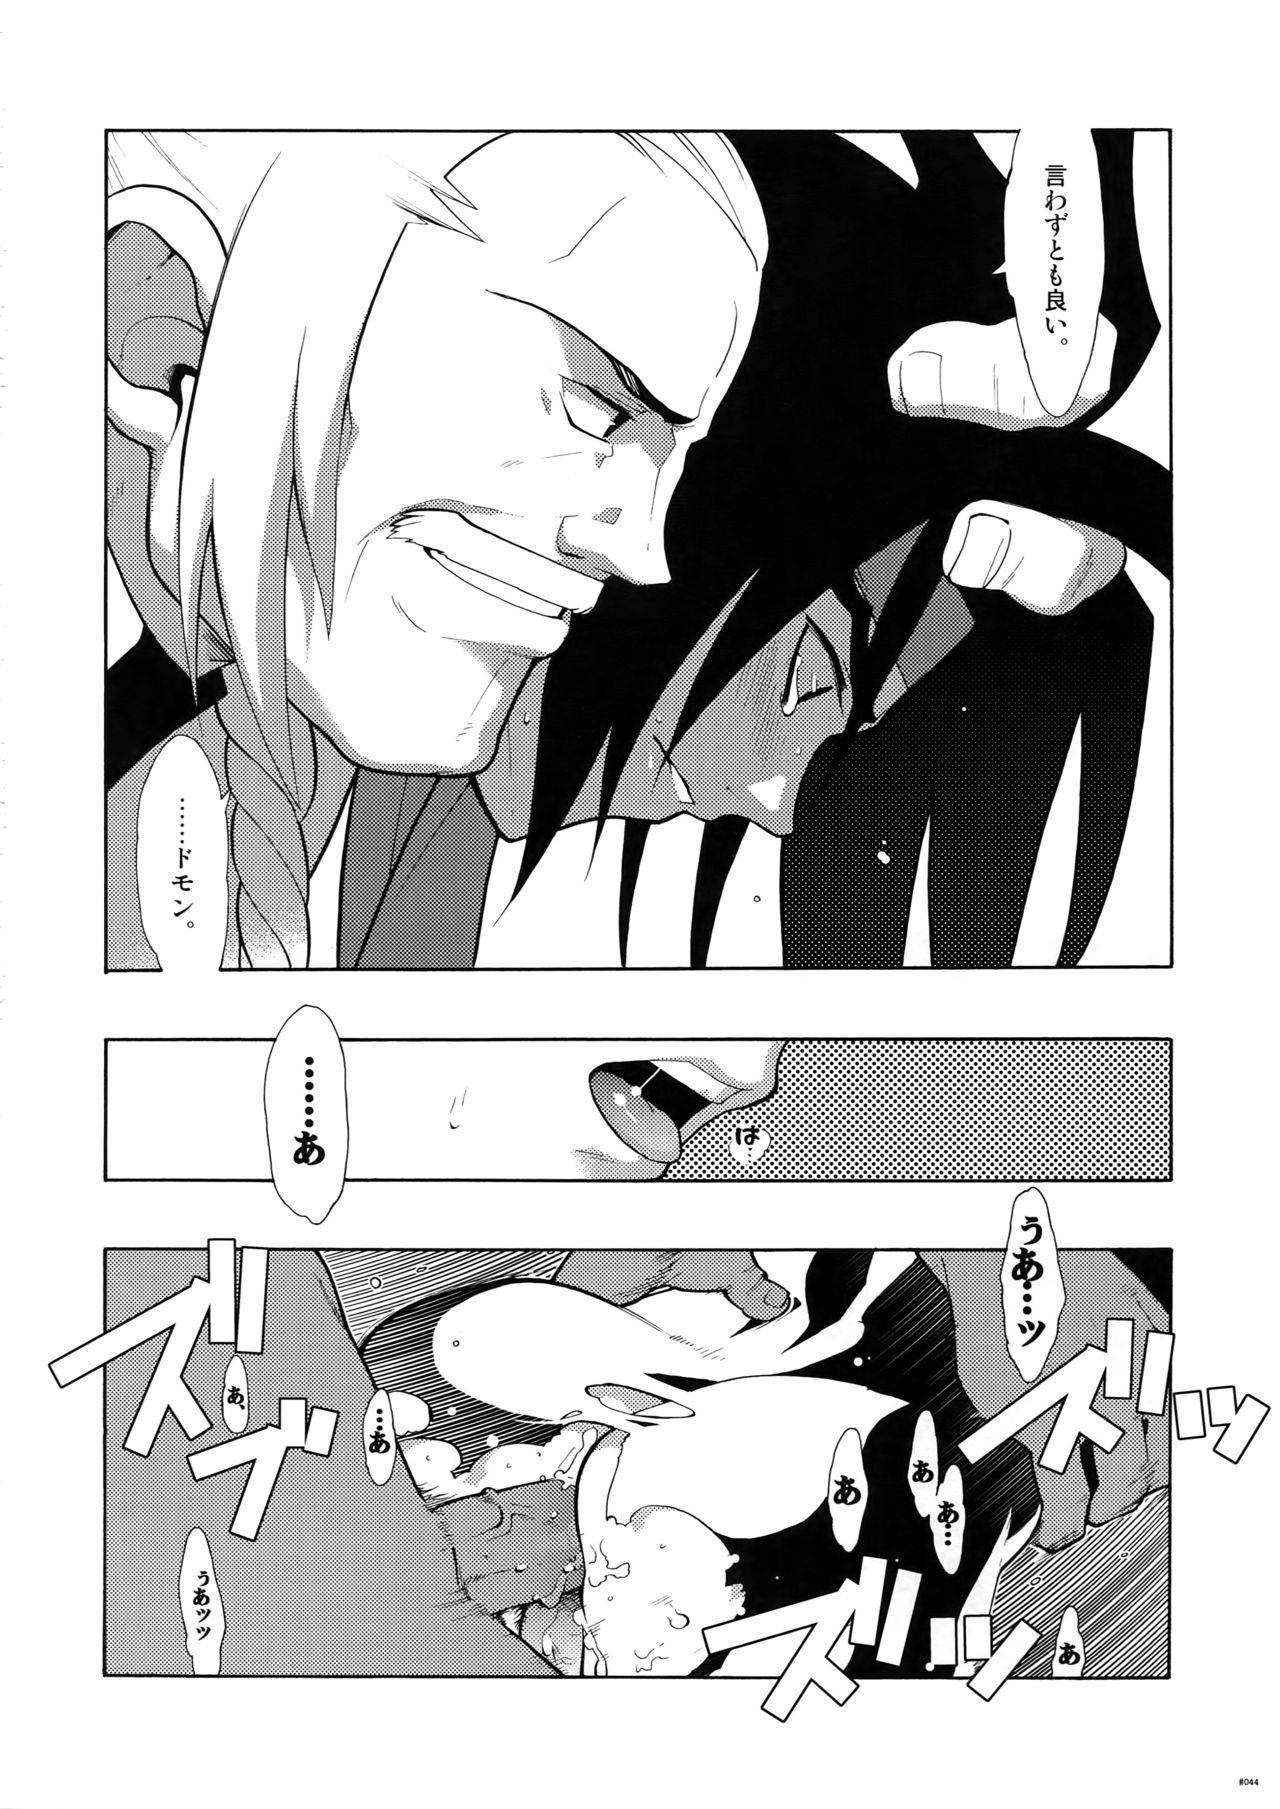 [Article 60 of Criminal Code (Shuhan)] G-gan Josei-Muke Sairoku-Shuu (G Gundam) 43